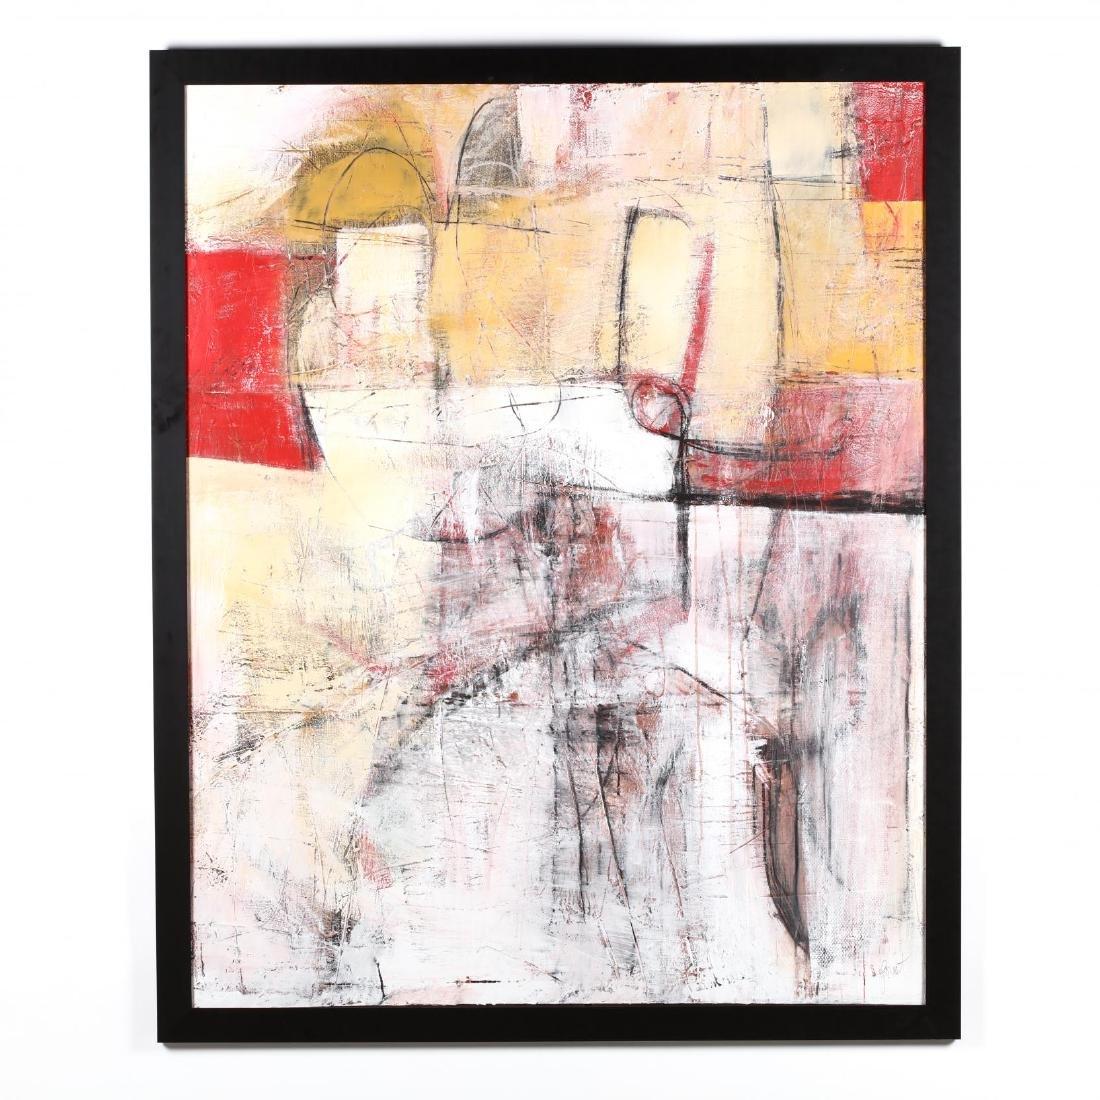 Charlotte Foust (NC), Untitled